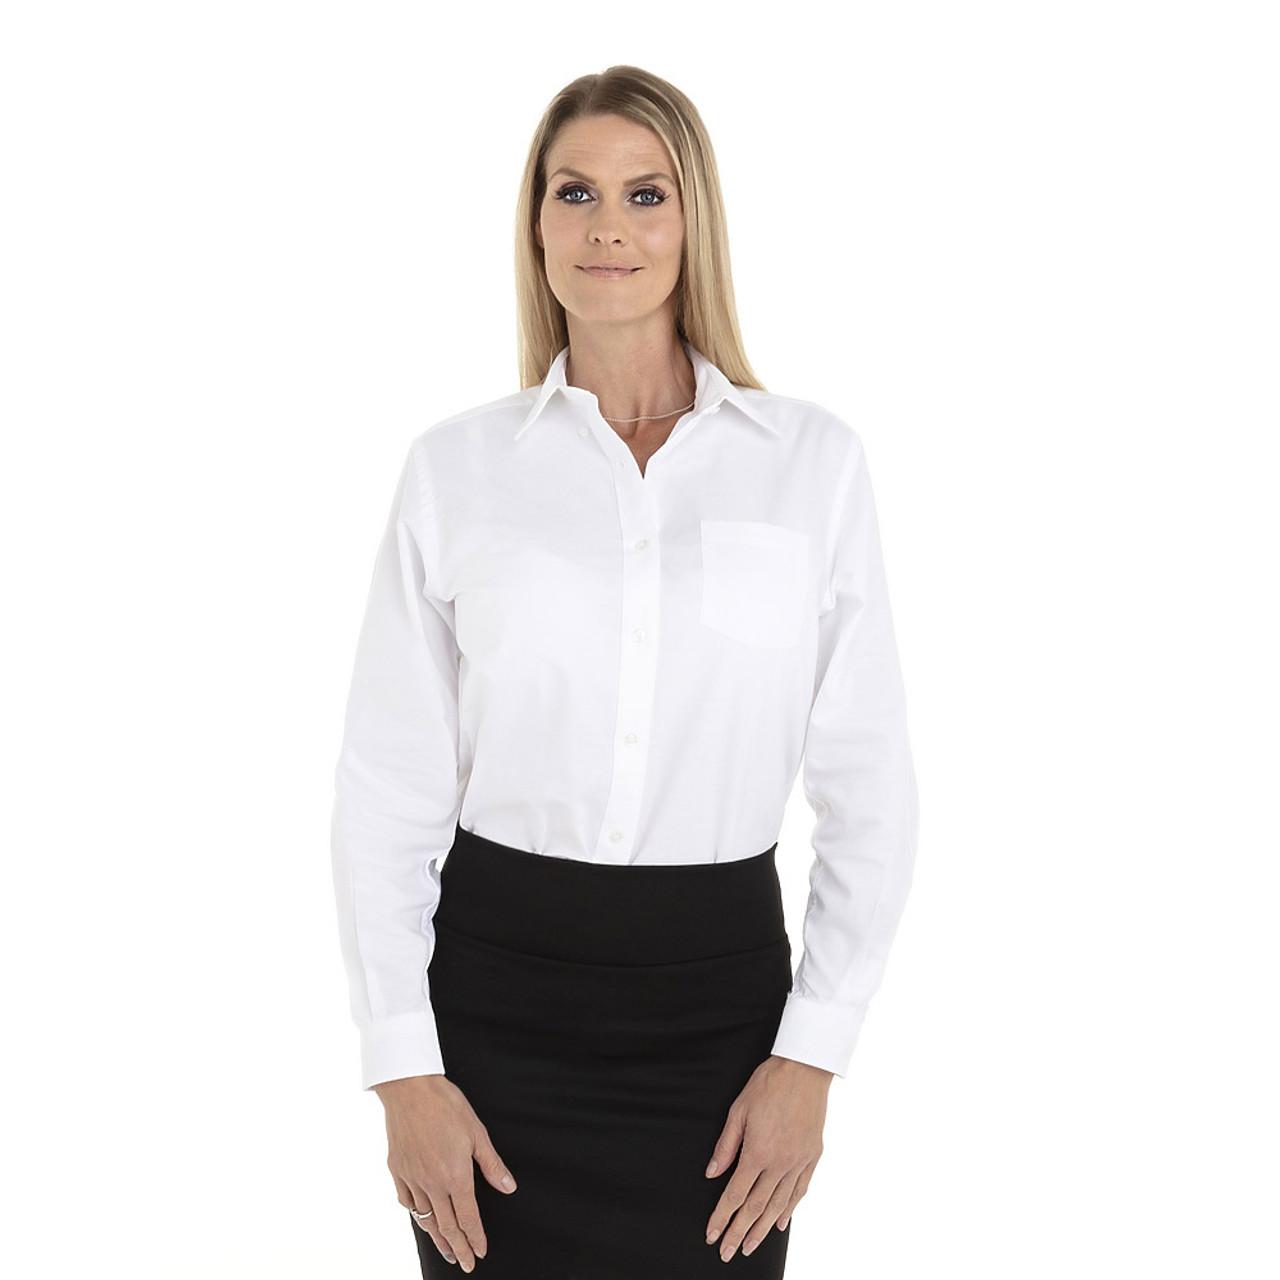 White - 18CV300 Van Heusen Ladies' Long Sleeve Oxford Shirt | T-shirt.ca